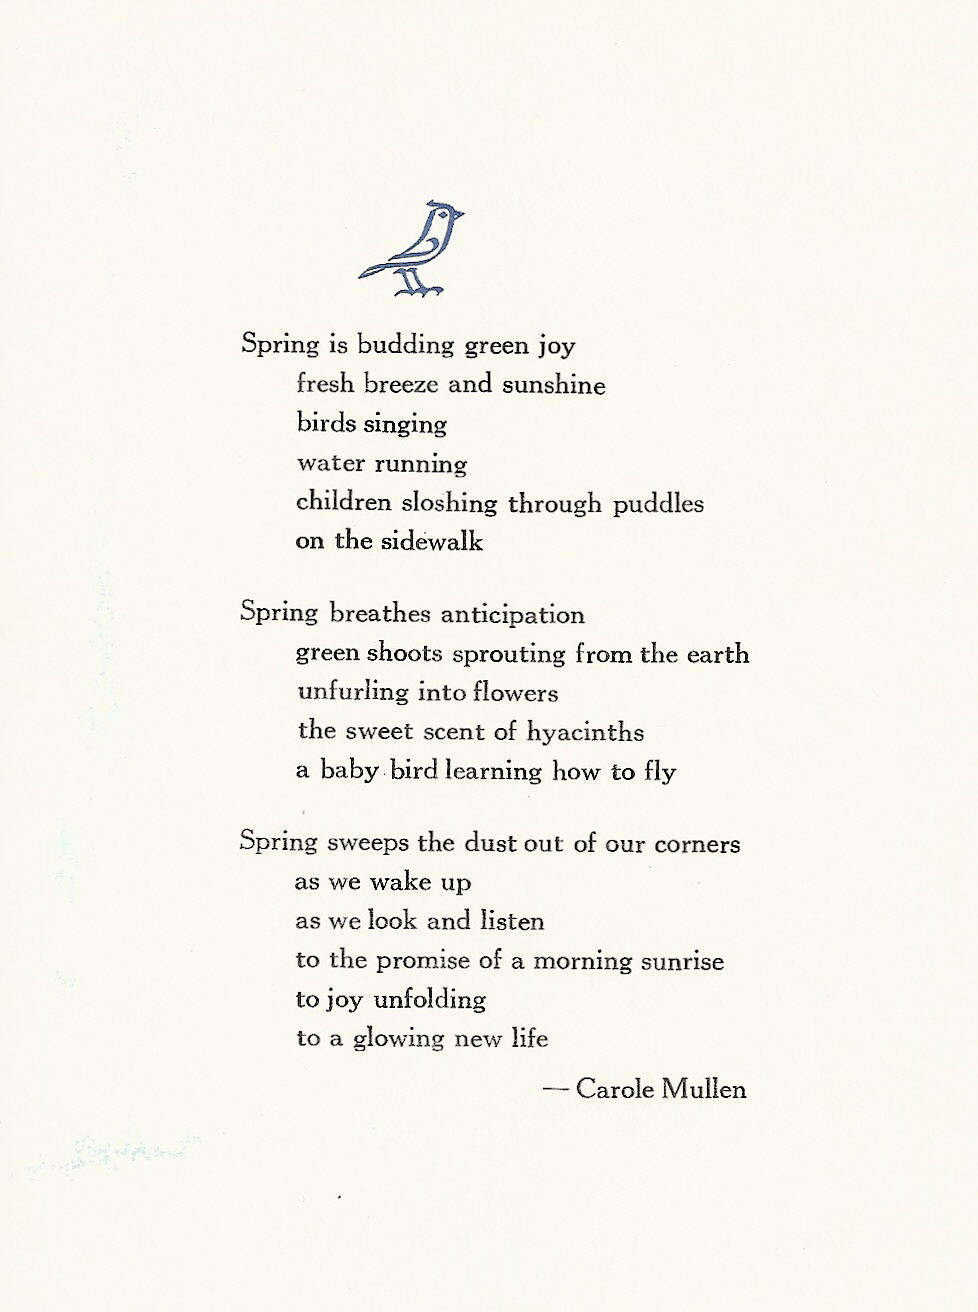 haiku poems about spring - photo #18